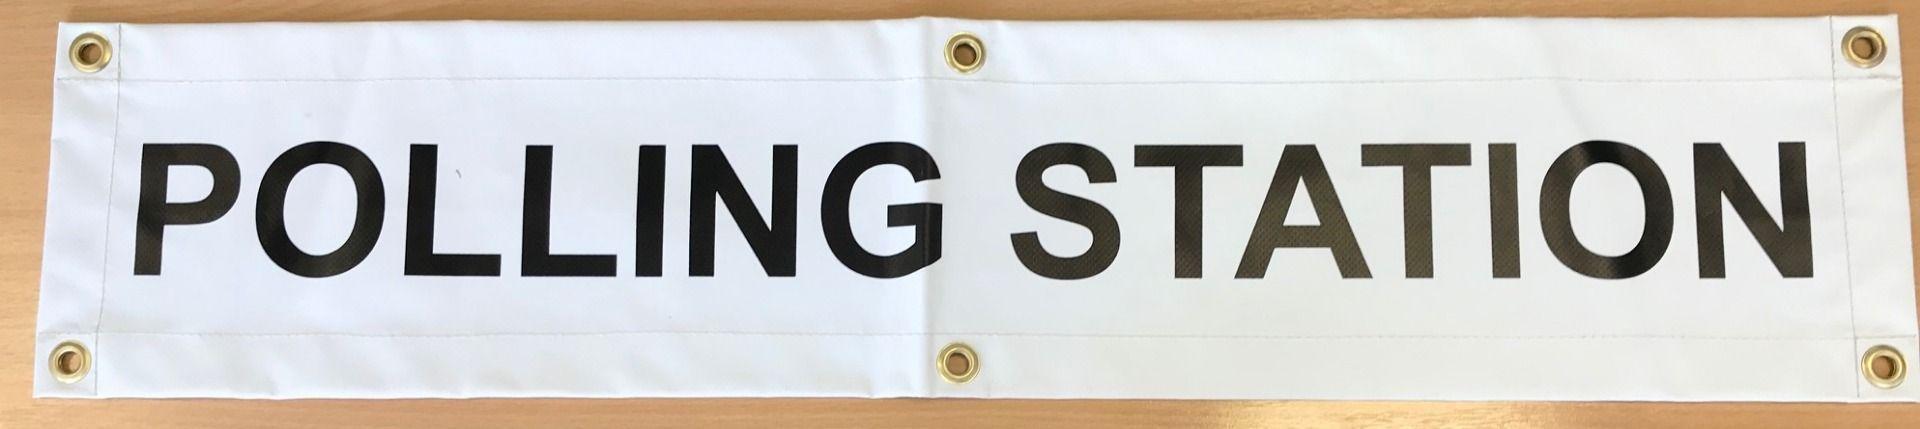 Electoral Polling Station Sign